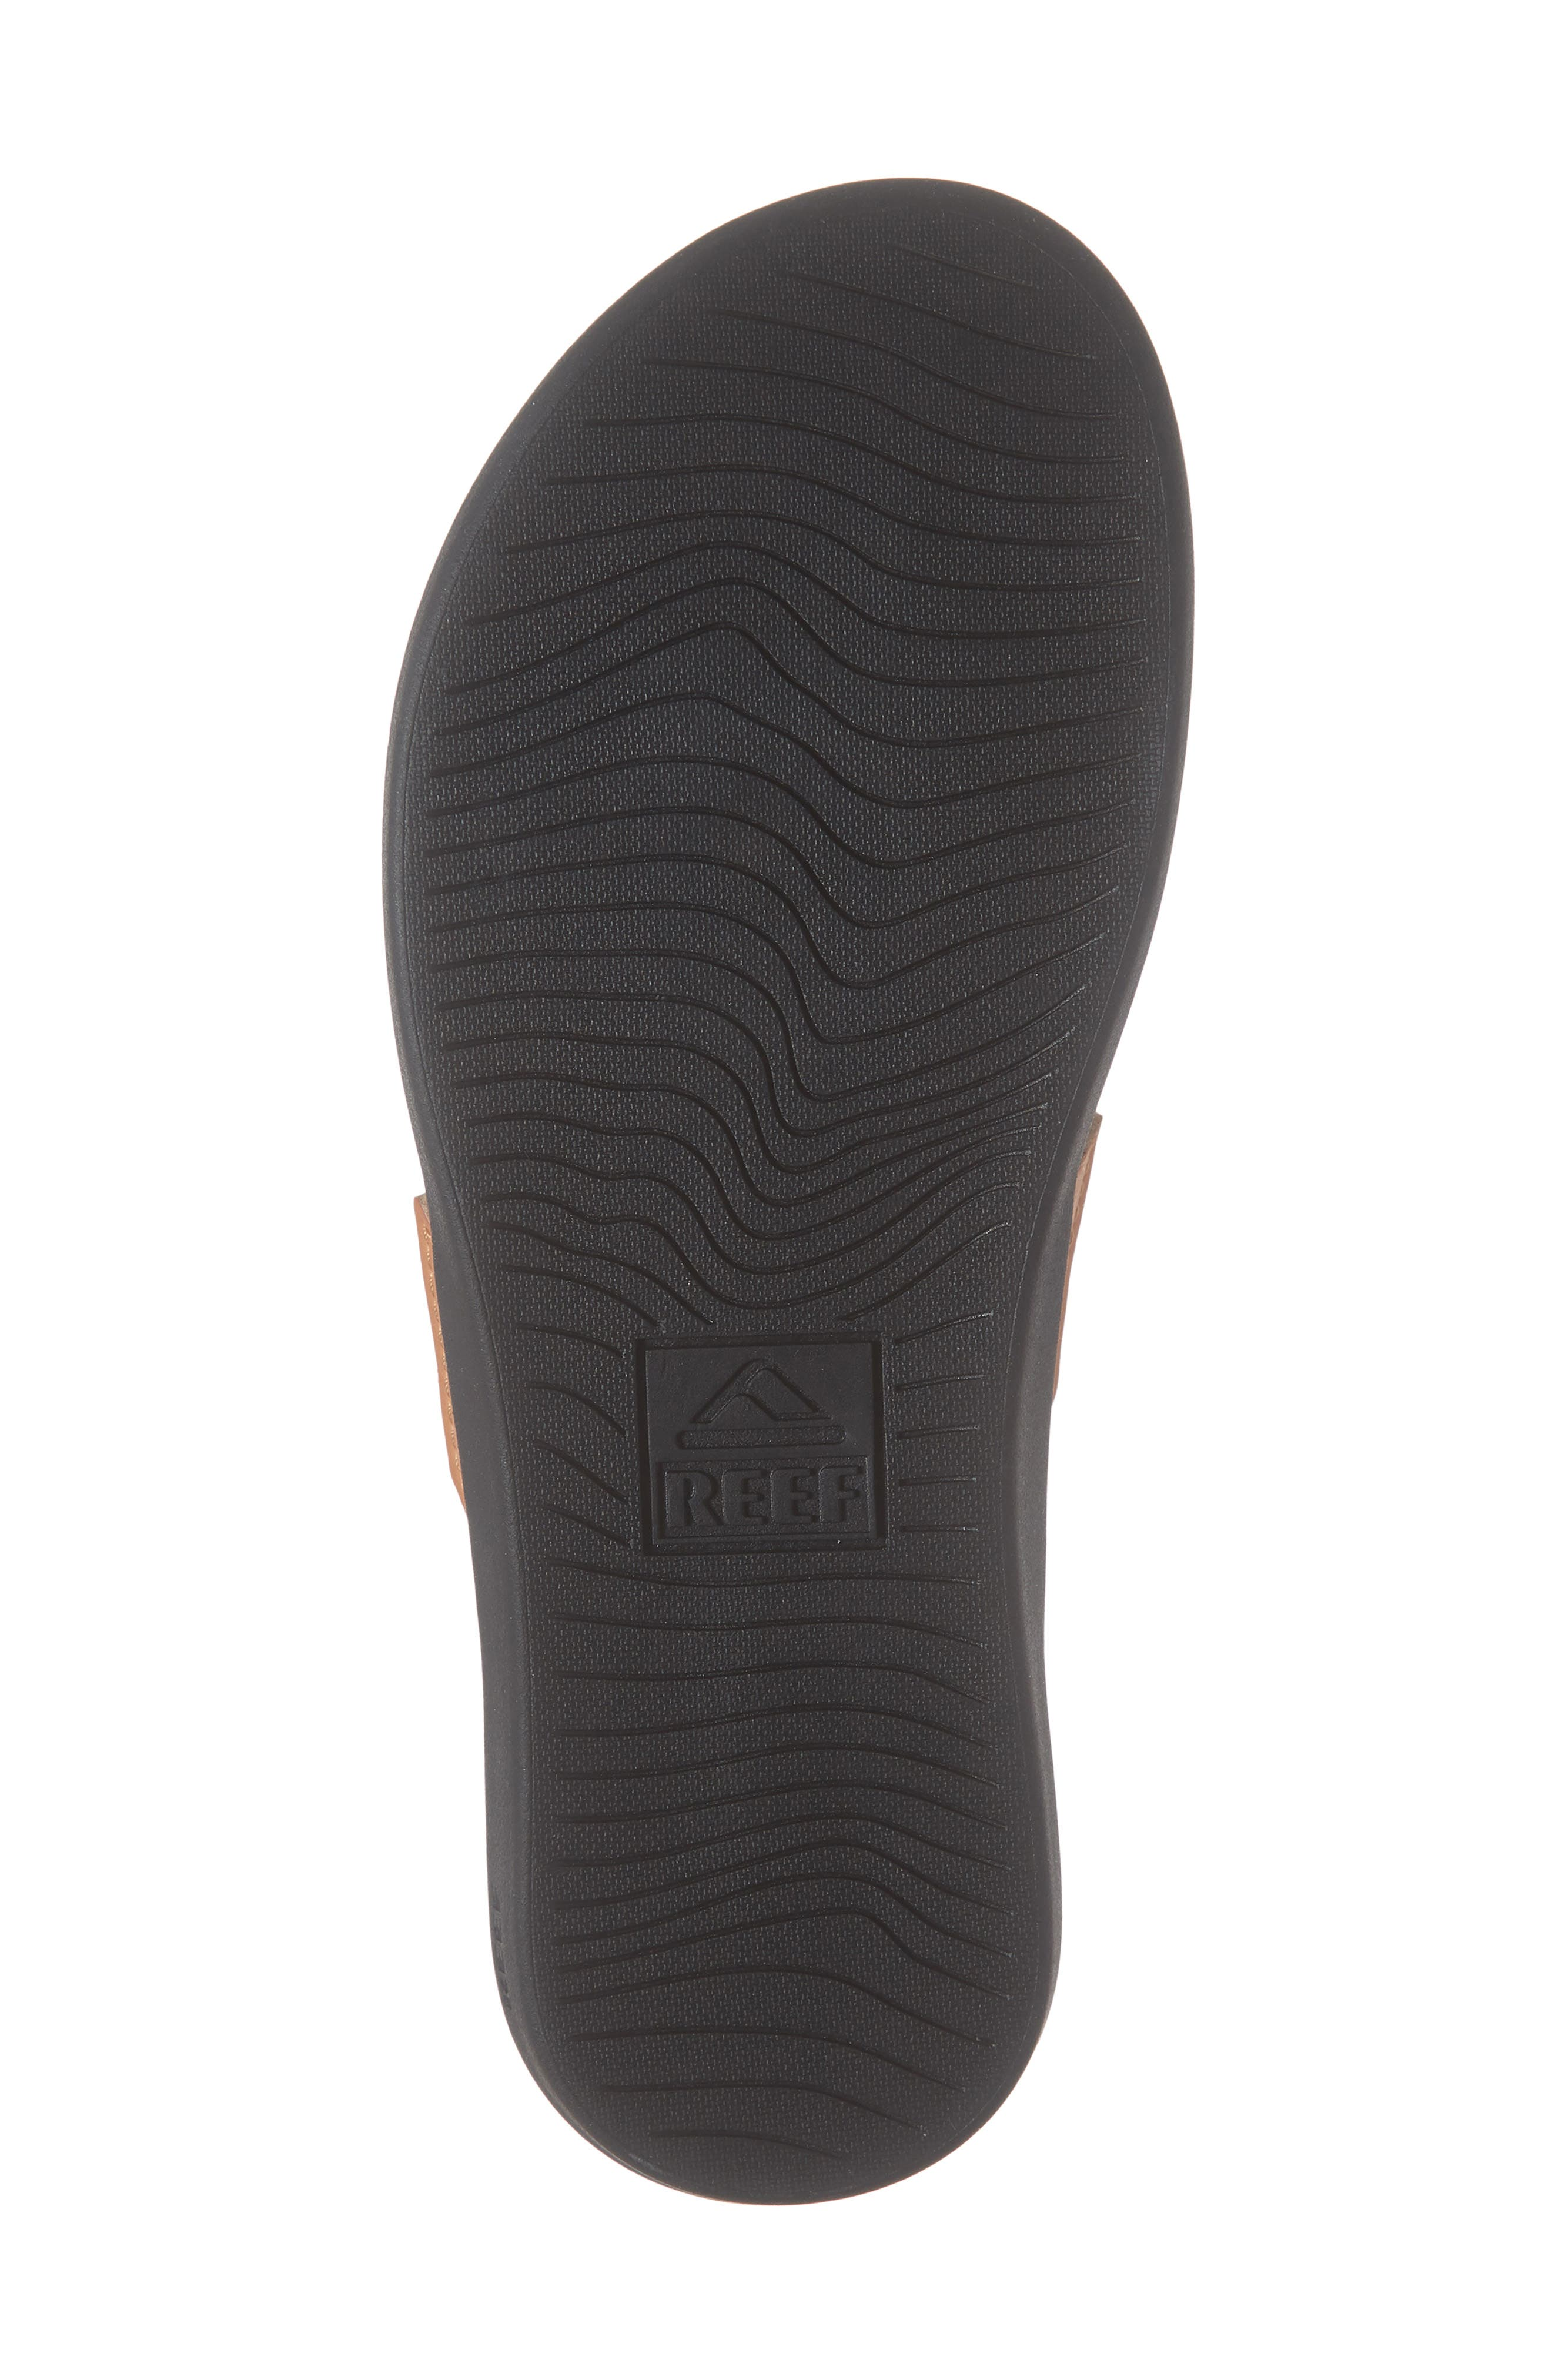 REEF, Ortho-Bounce Woven Flip Flop, Alternate thumbnail 6, color, BLACK/ WHITE